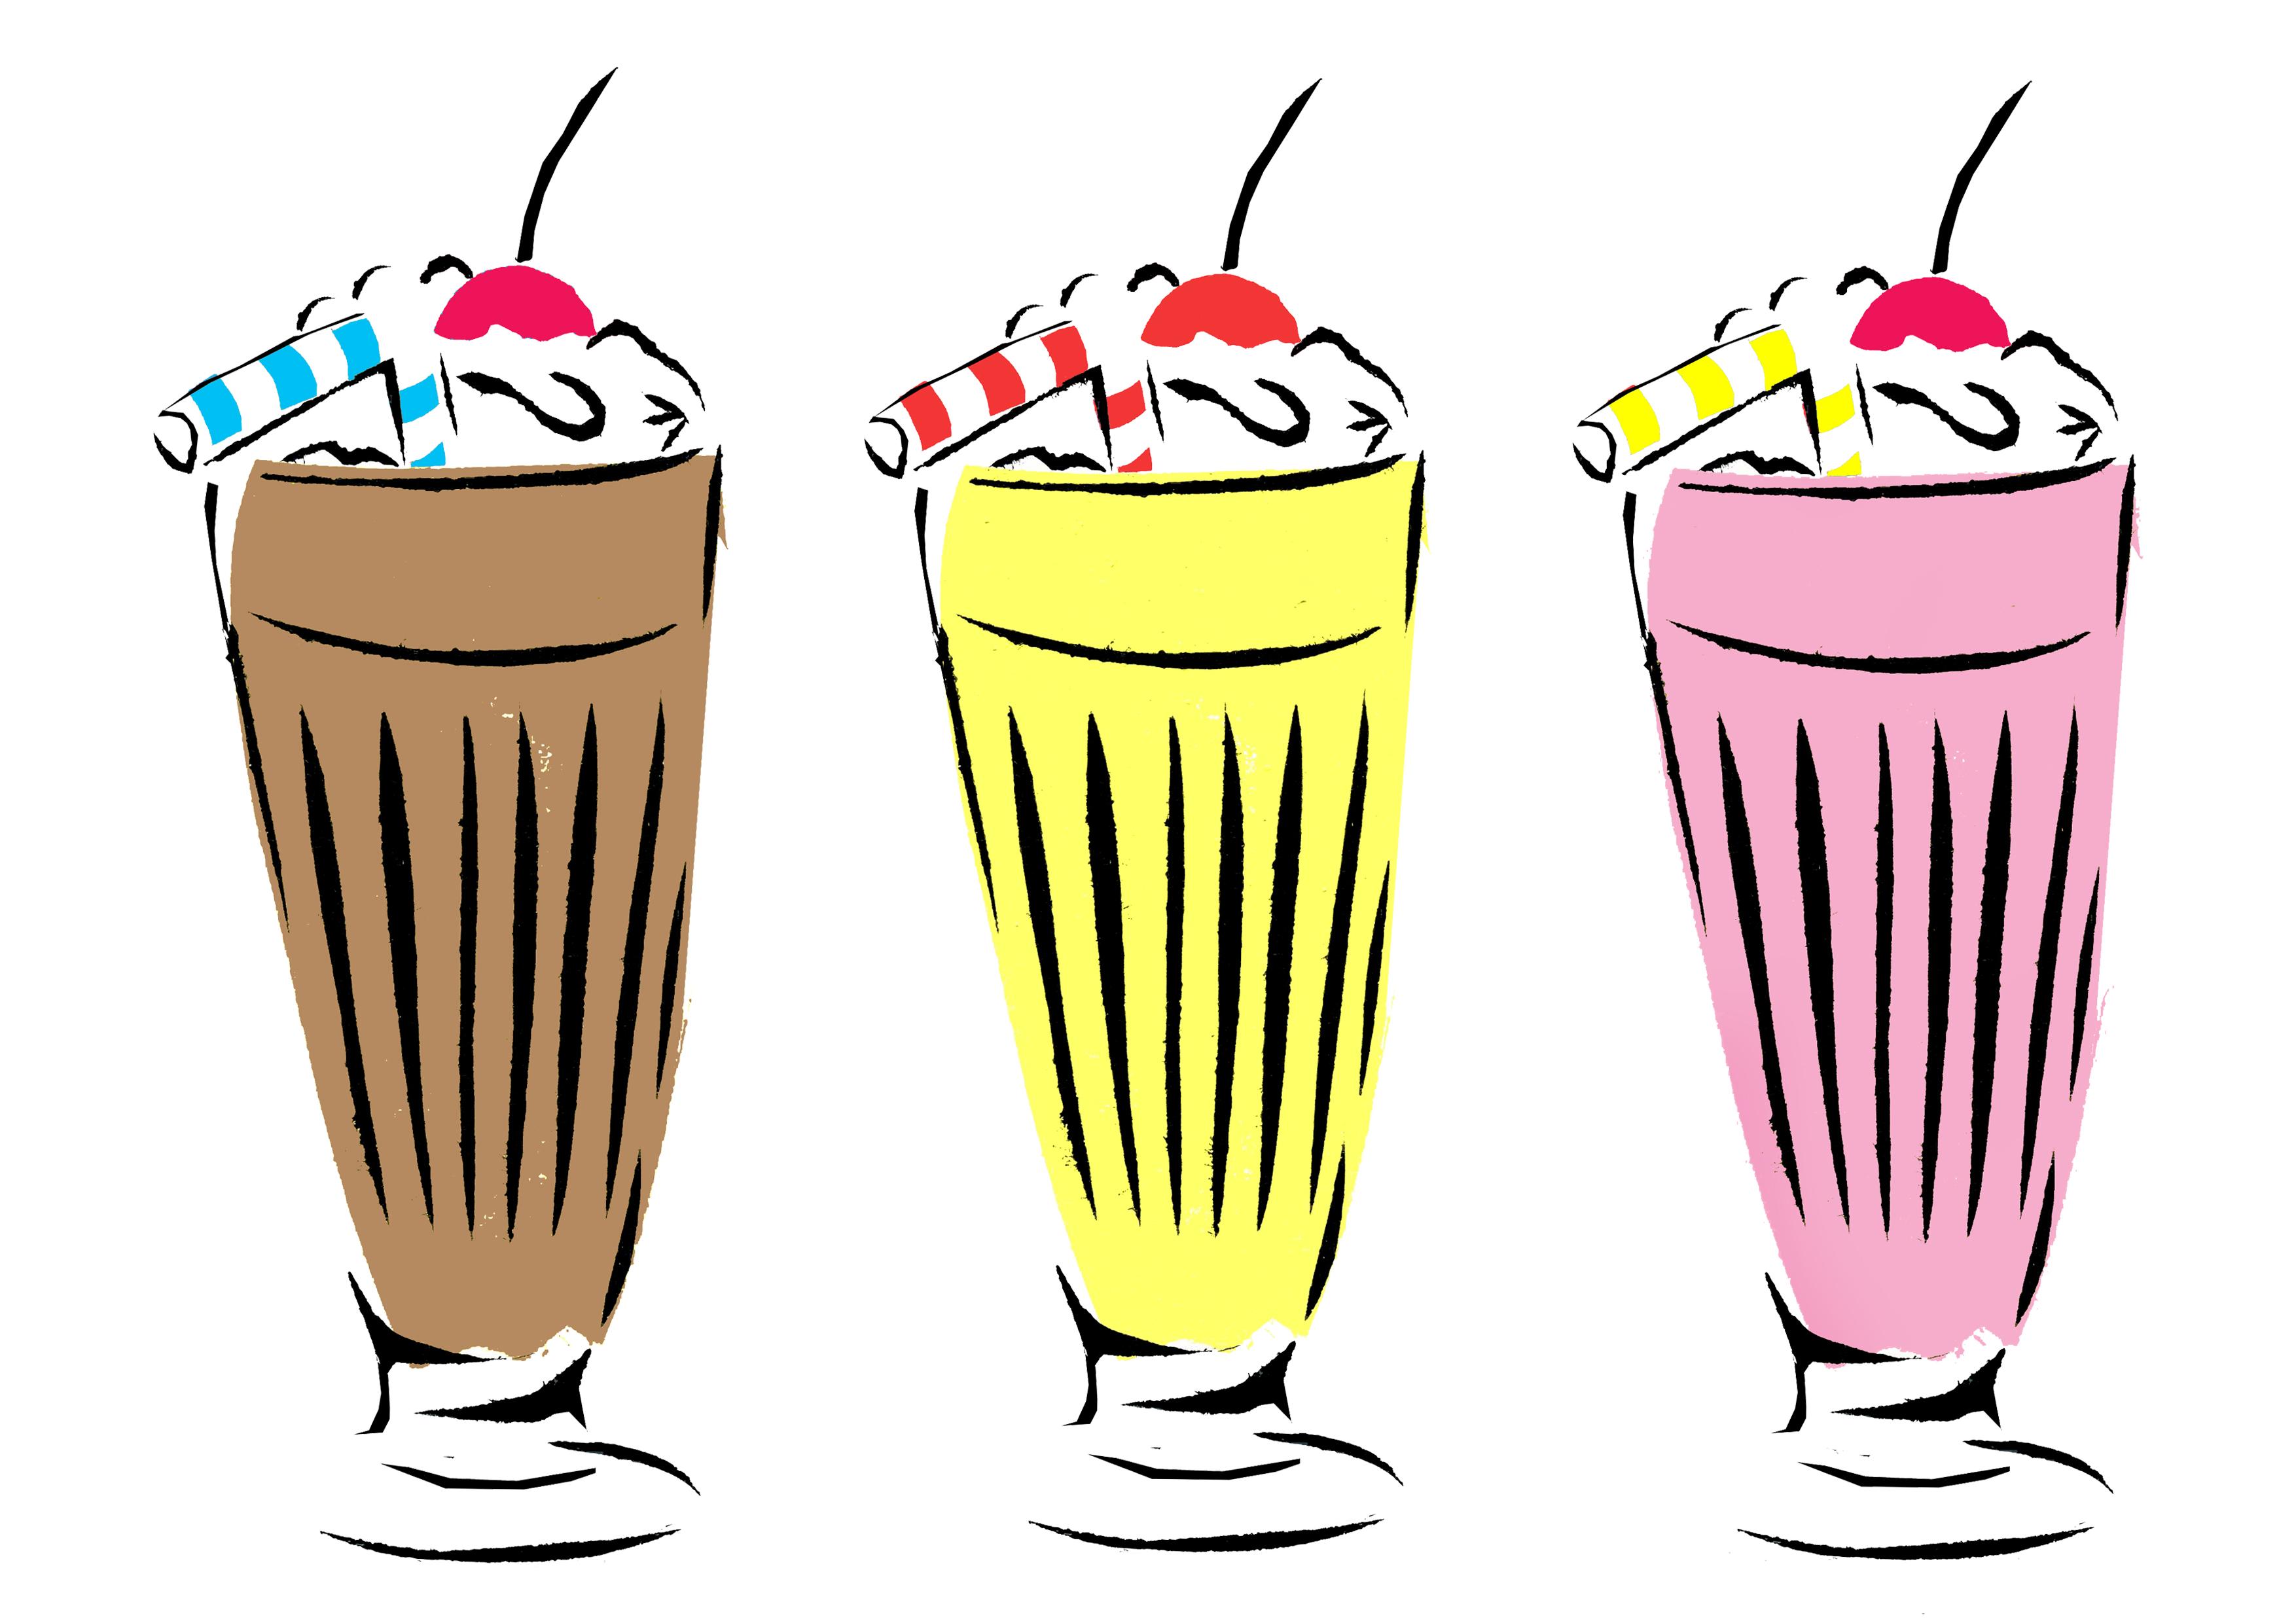 Picture free download best. Milkshake clipart 50's